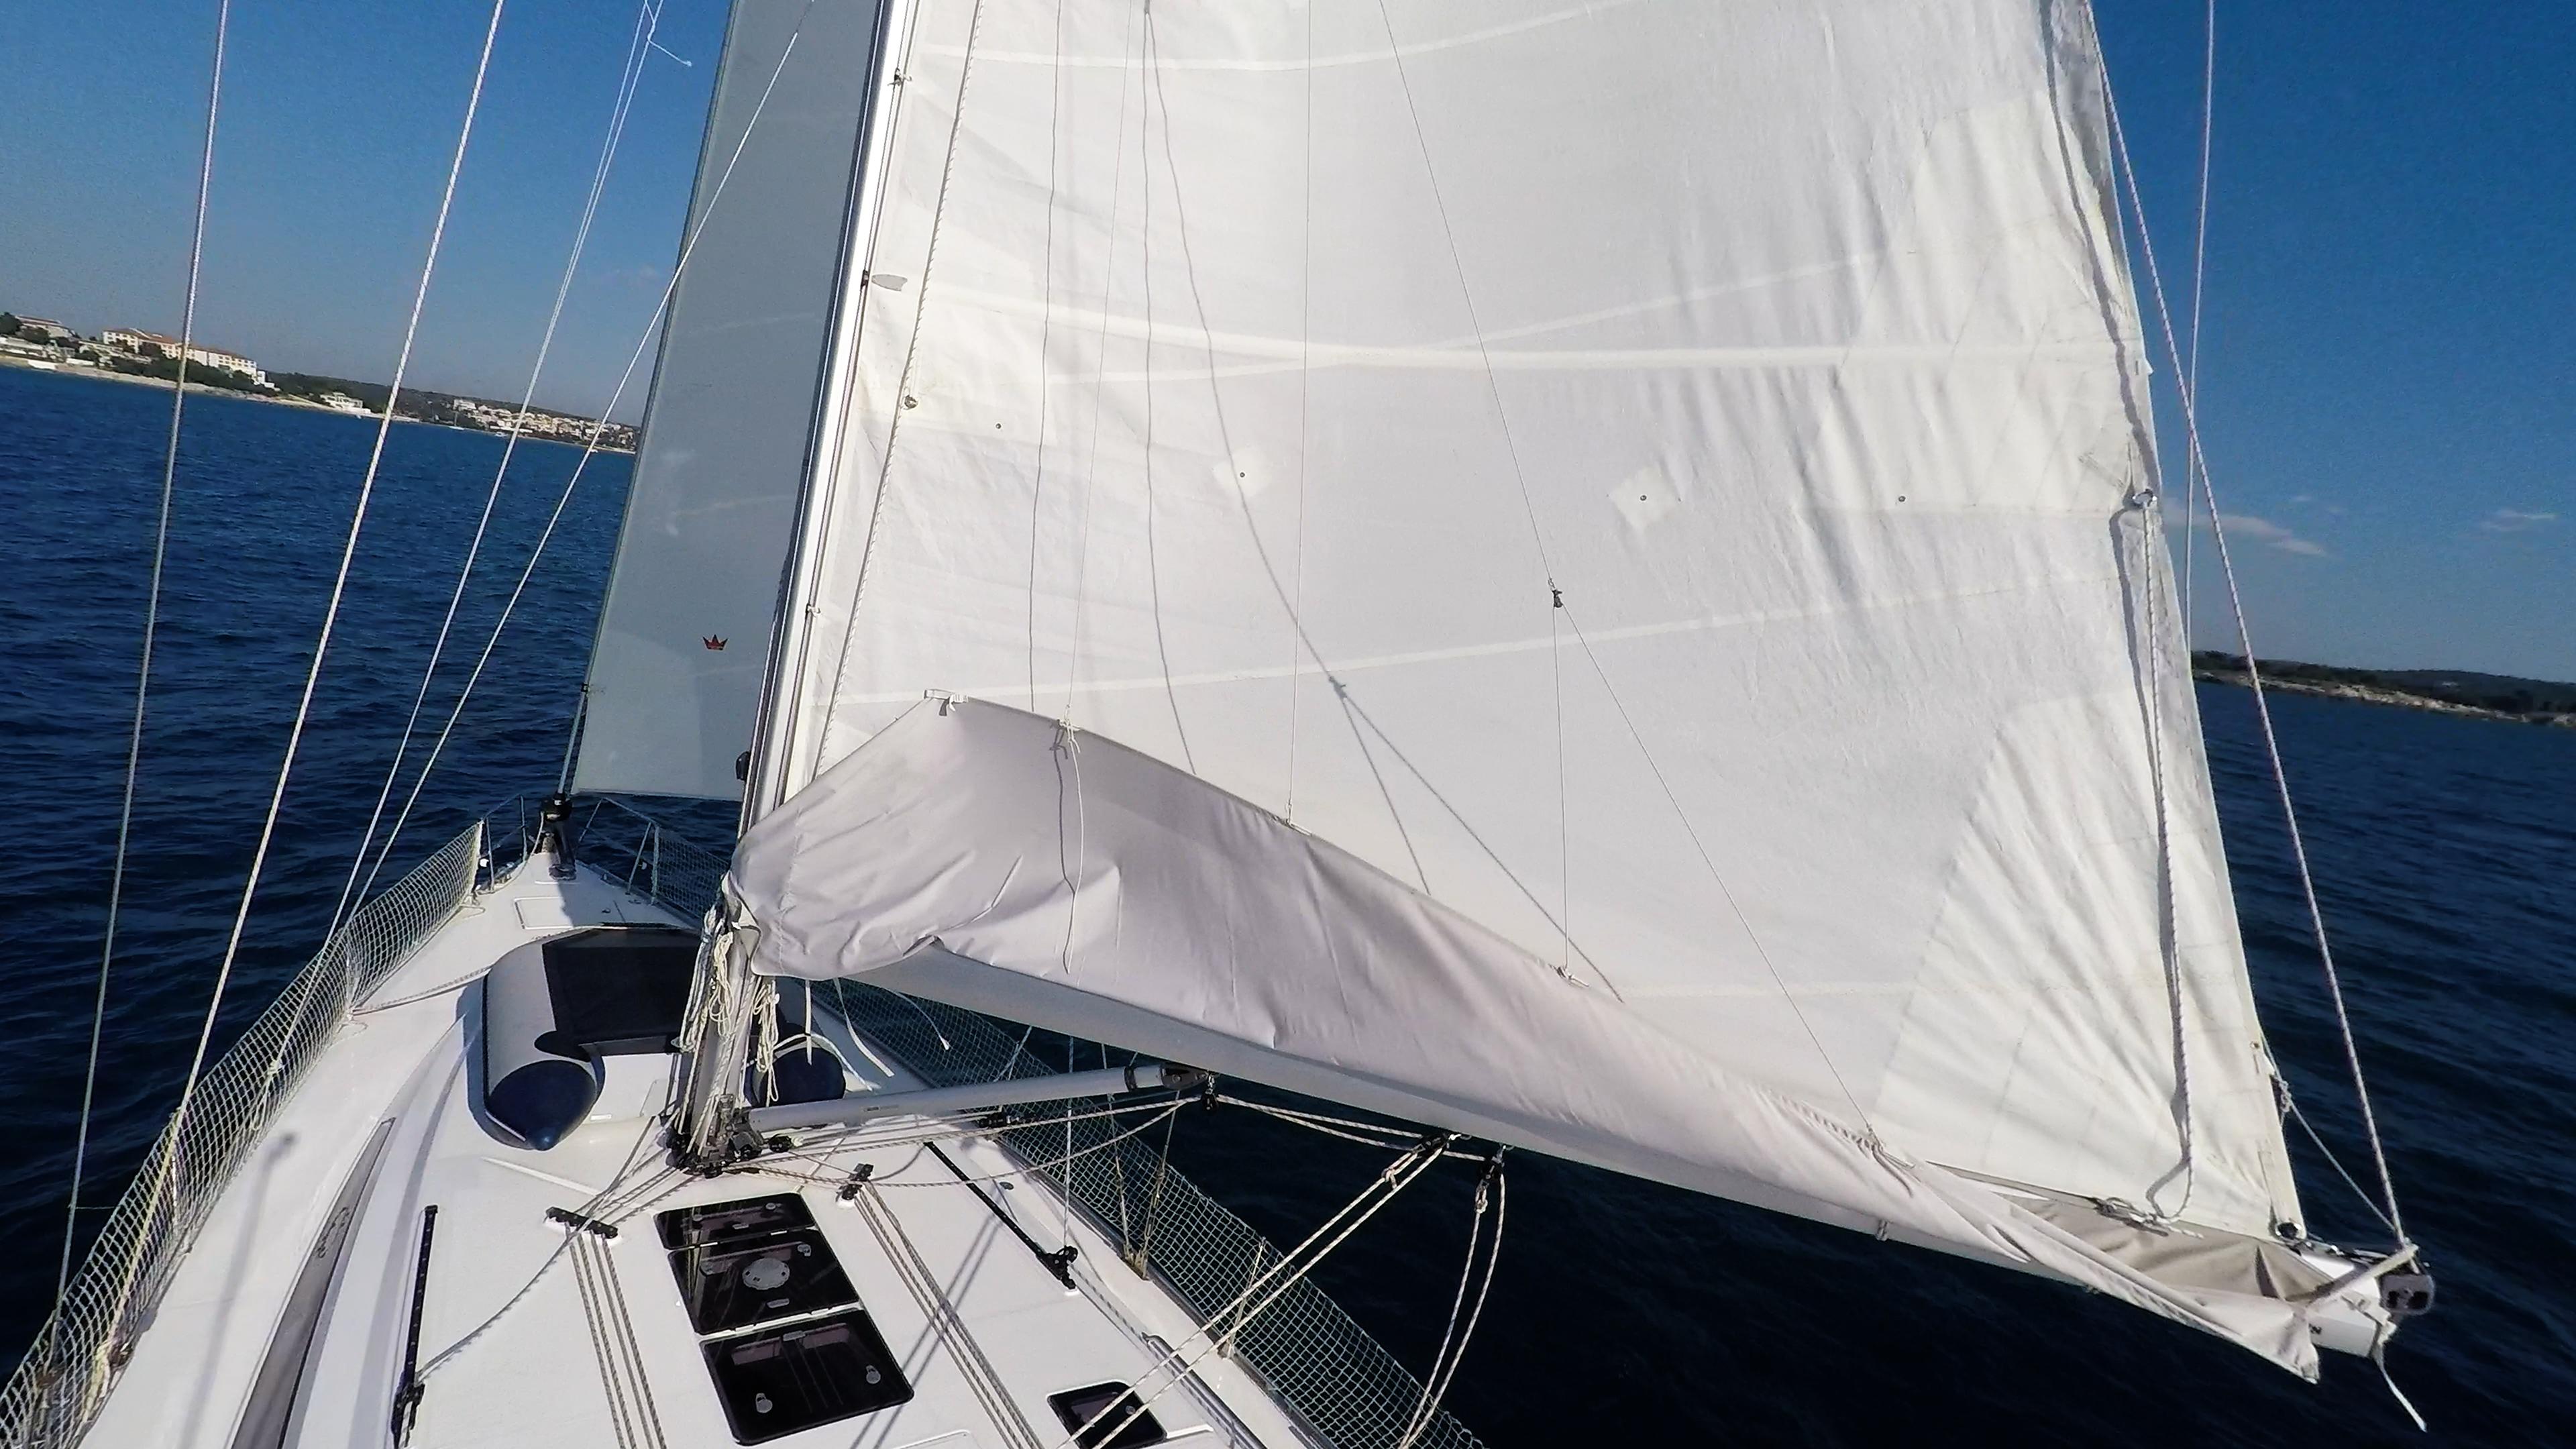 sailing yacht sails deck sailboat mast